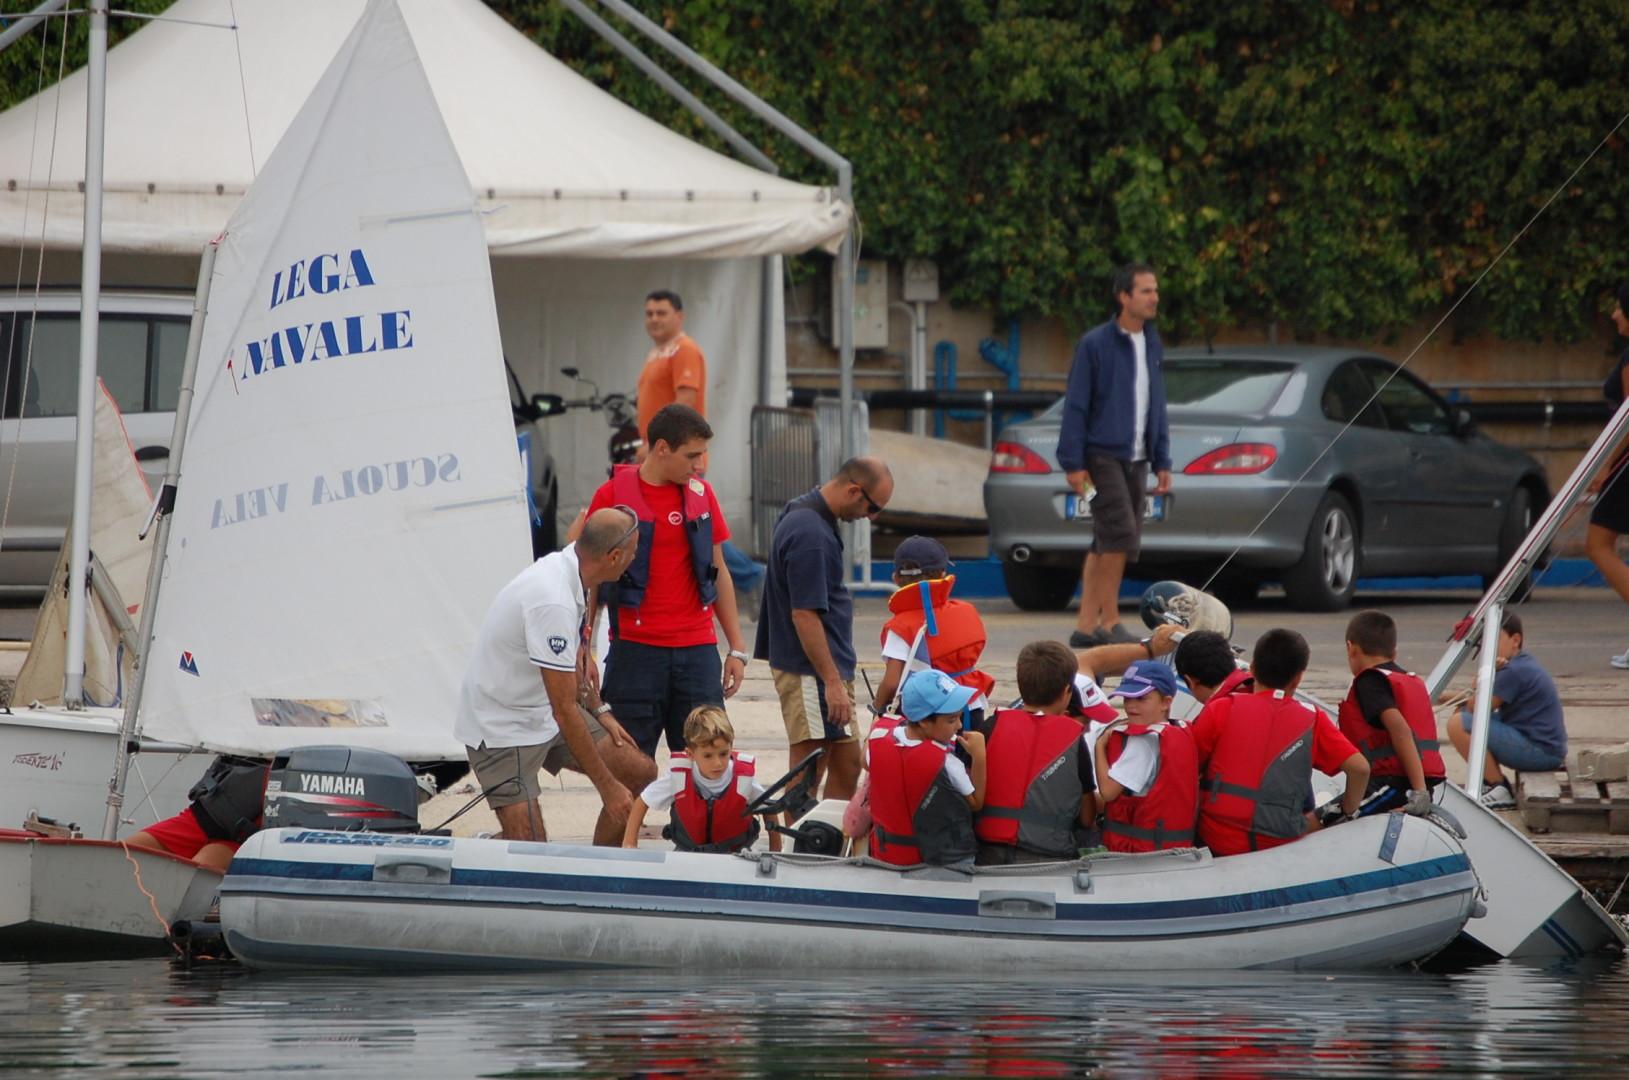 Scuola-di-vela-lega-navale-LNI-Brindisi (17)